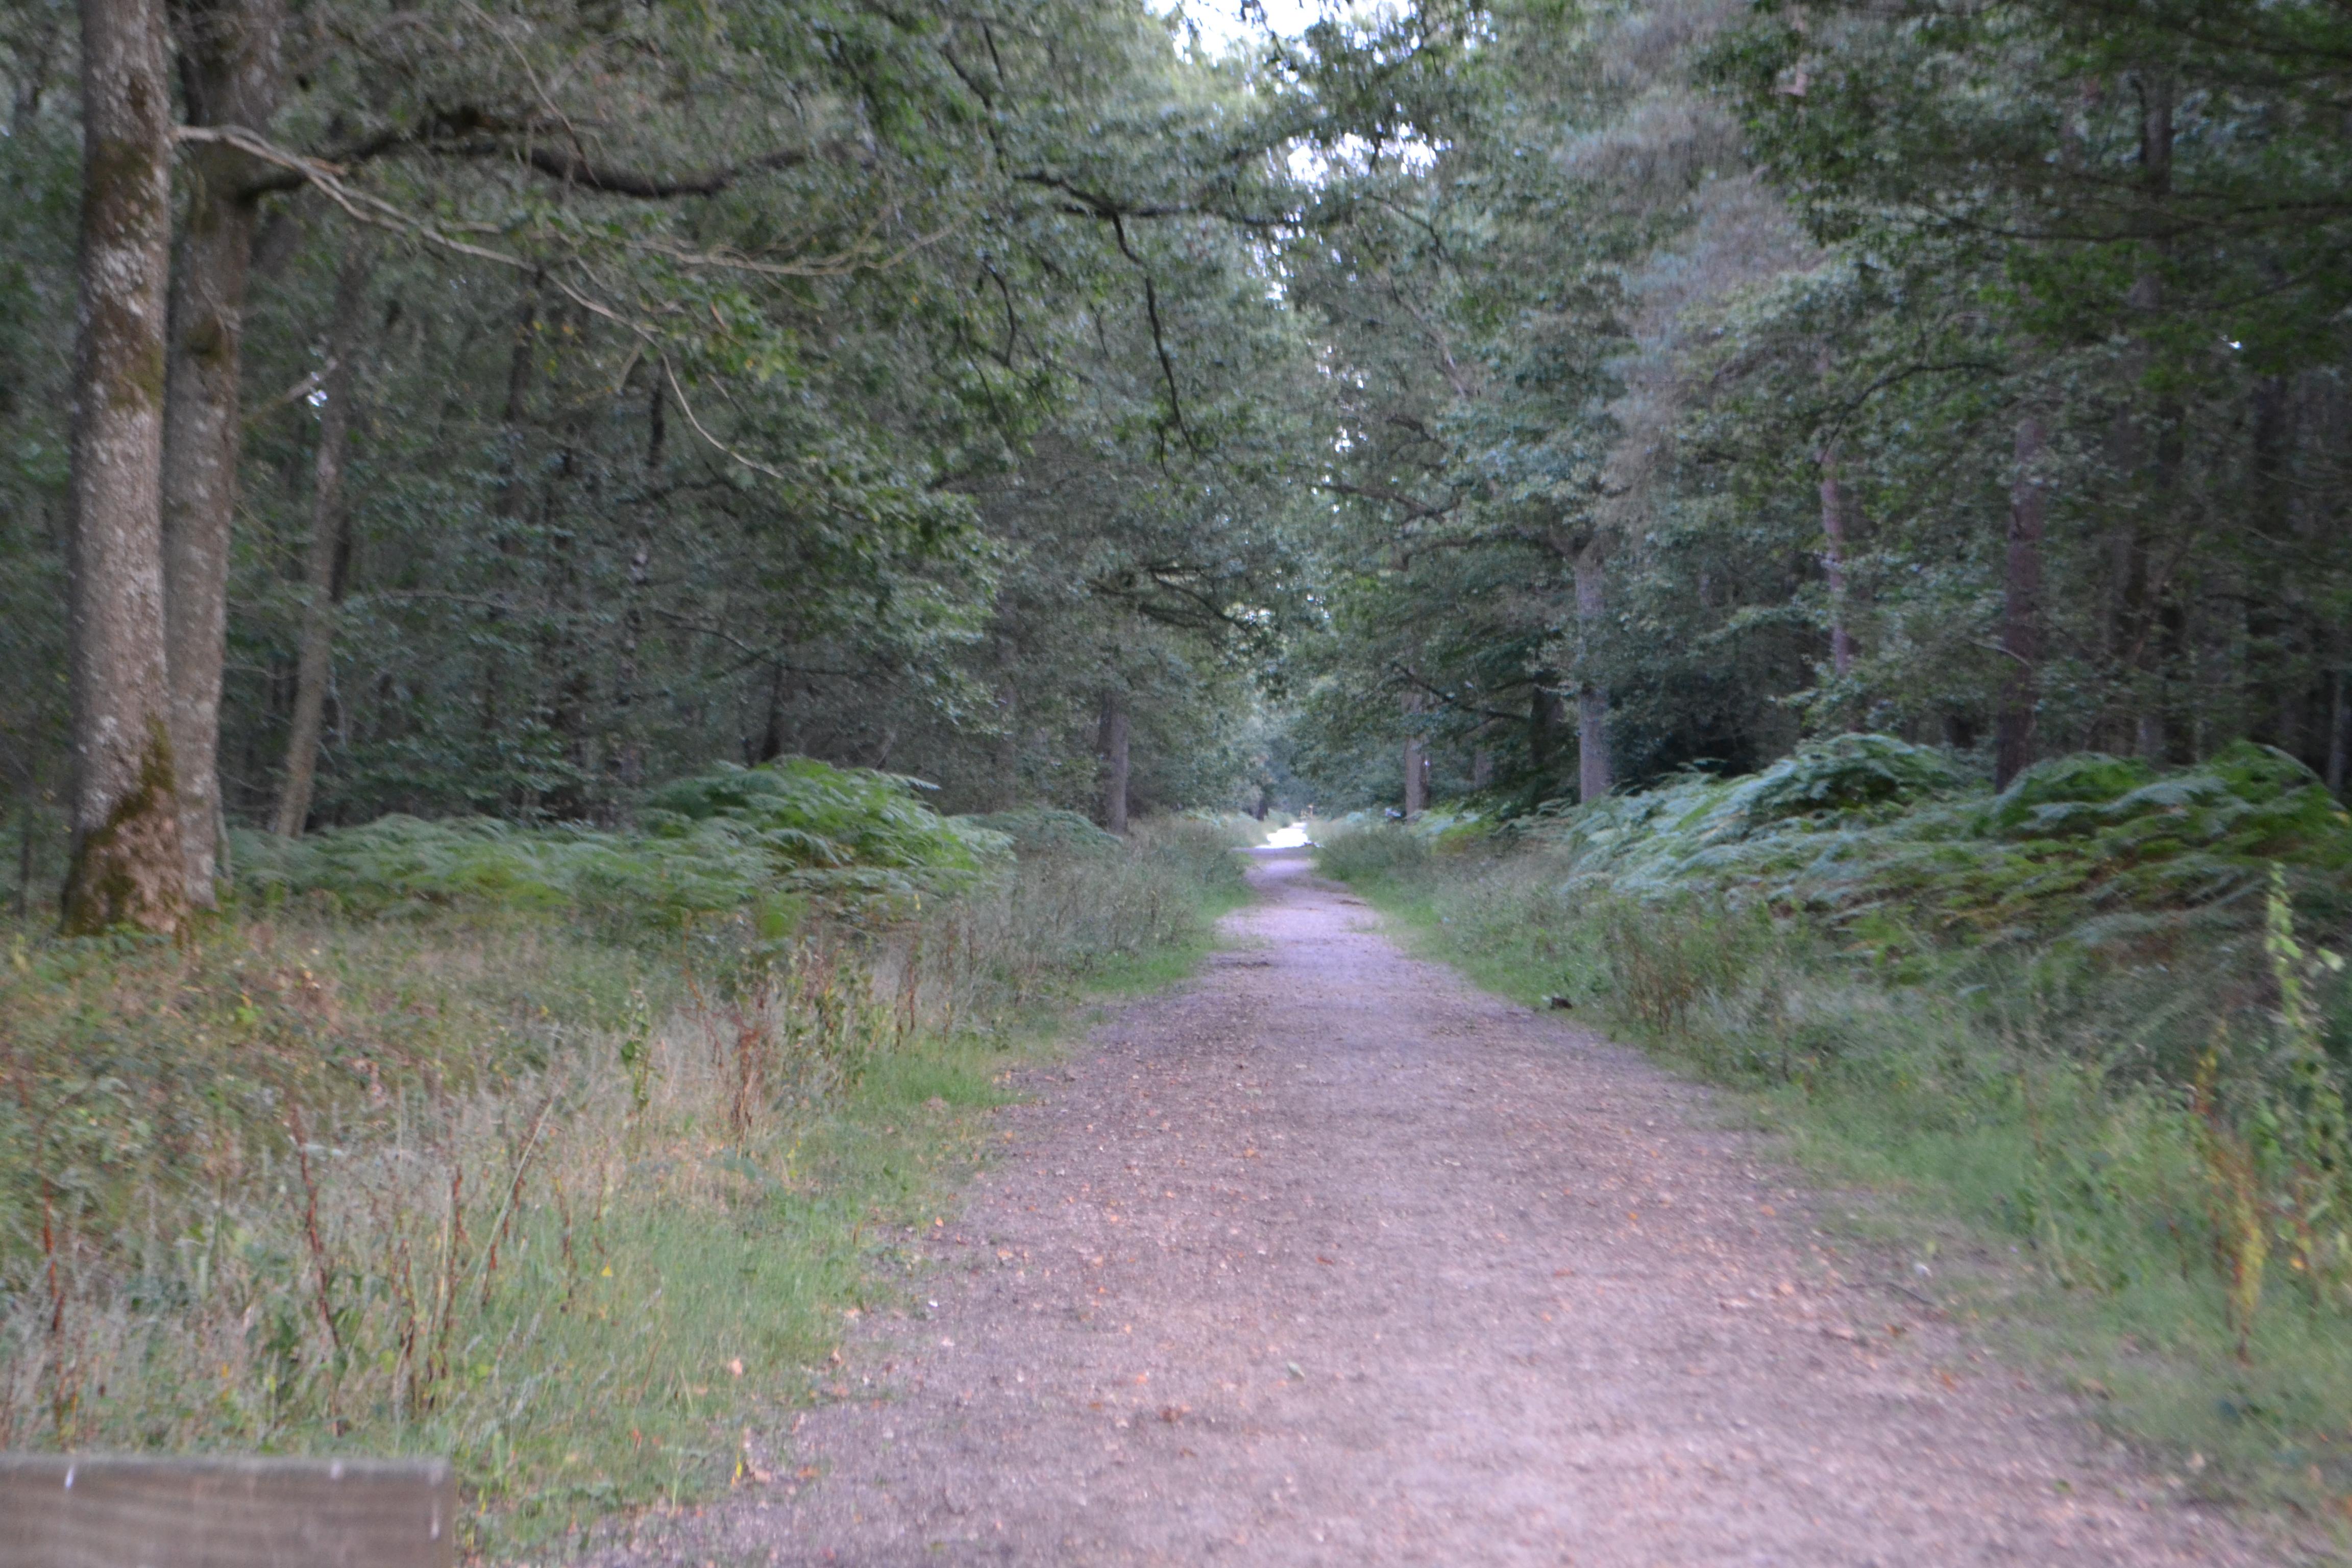 Equi event randonn es et promenades dans les yvelines for Promenade dans les yvelines